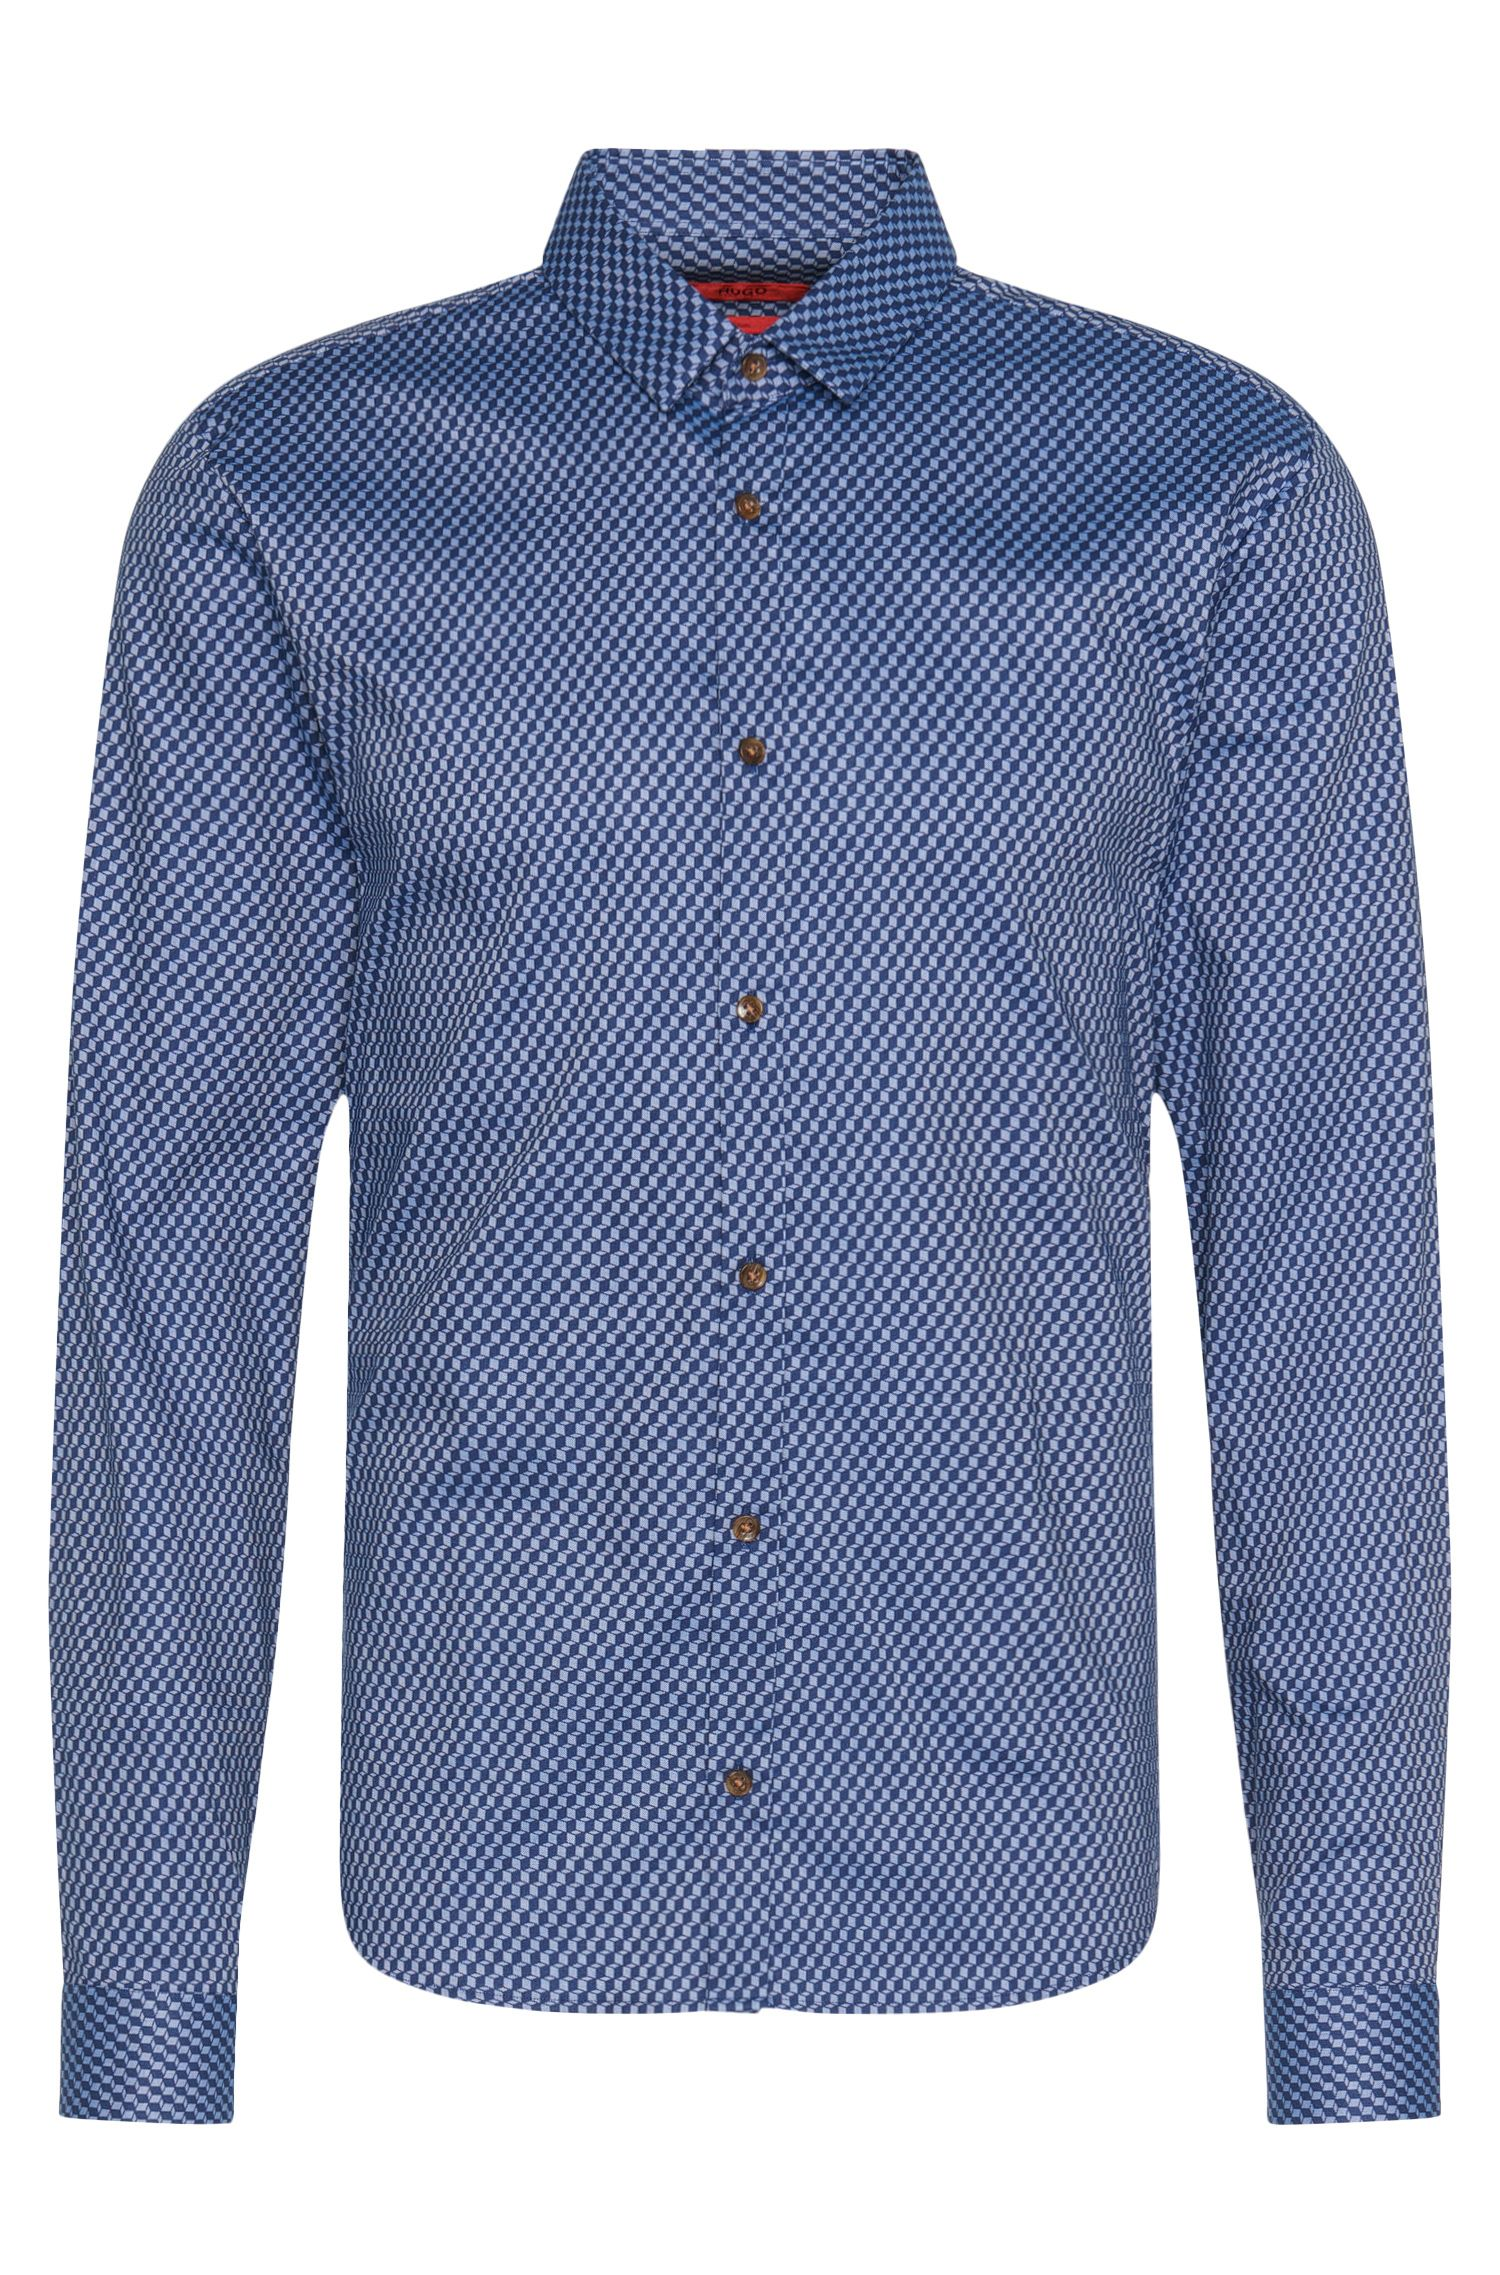 'Ero' | 'Slim Fit, Cotton Button Down Shirt